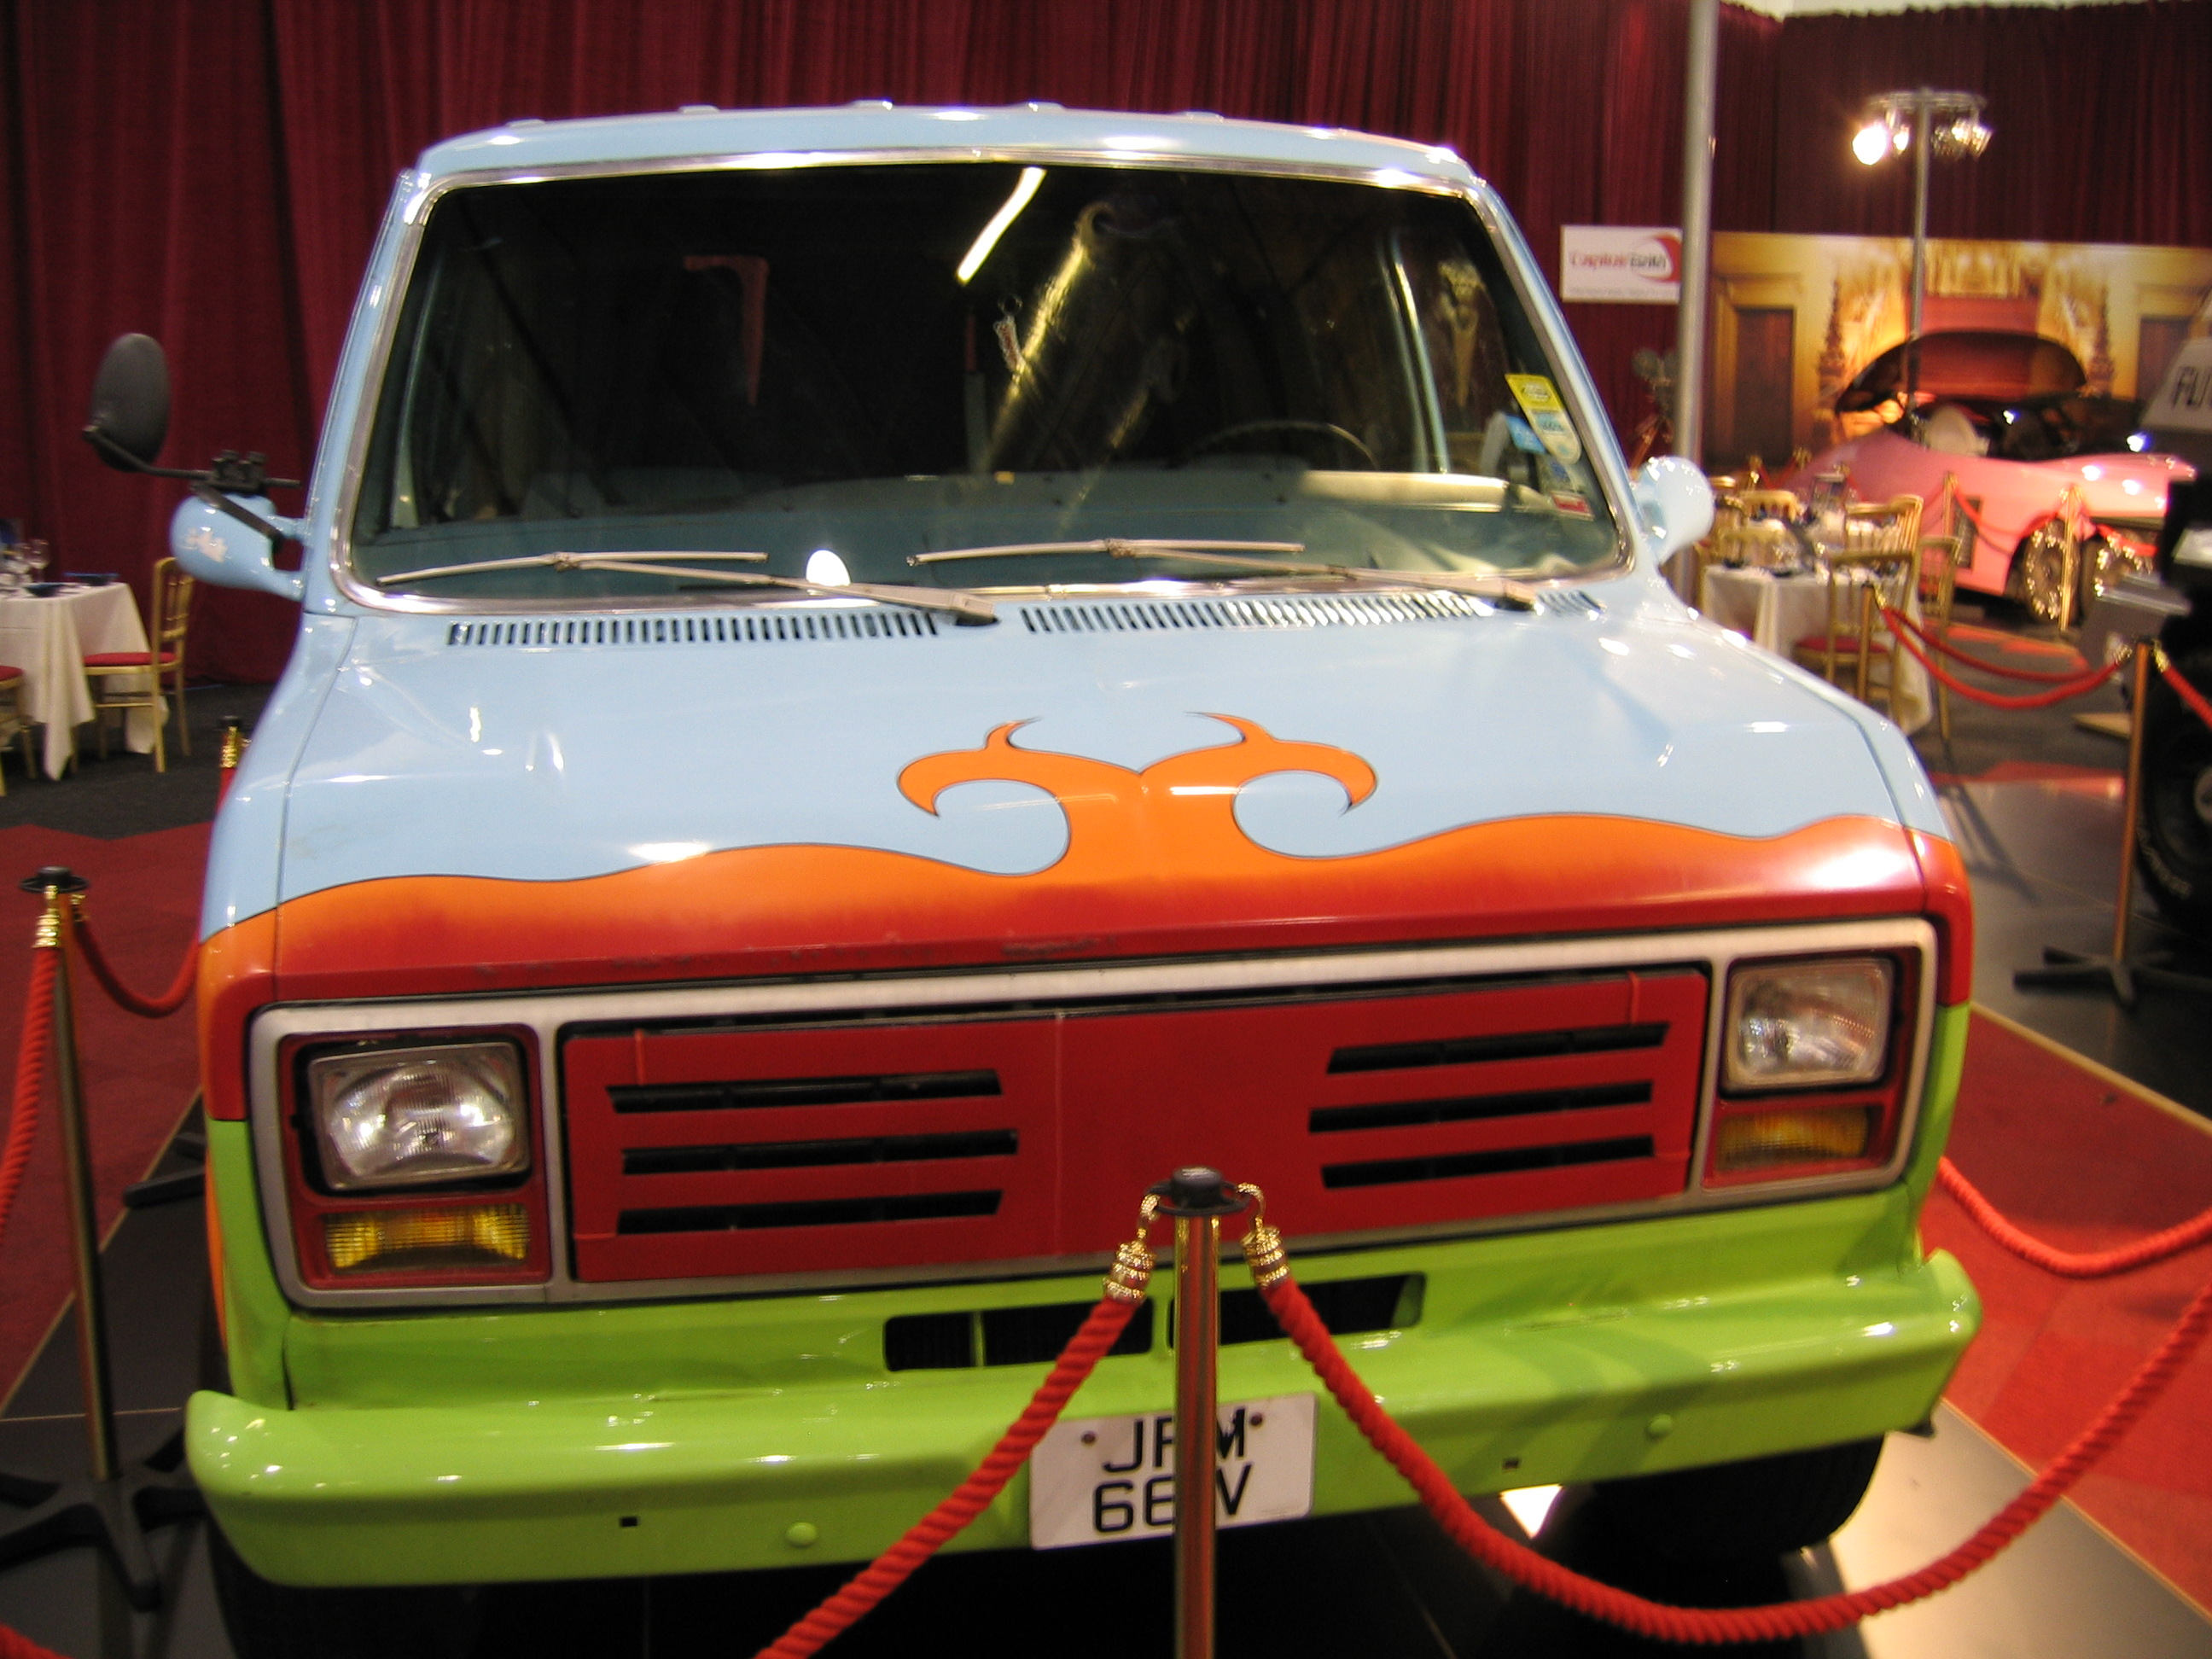 scooby doo ruh-roh, scooby doo the mystery car, scooby doo adventures, on scooby doo map in the mystery machine